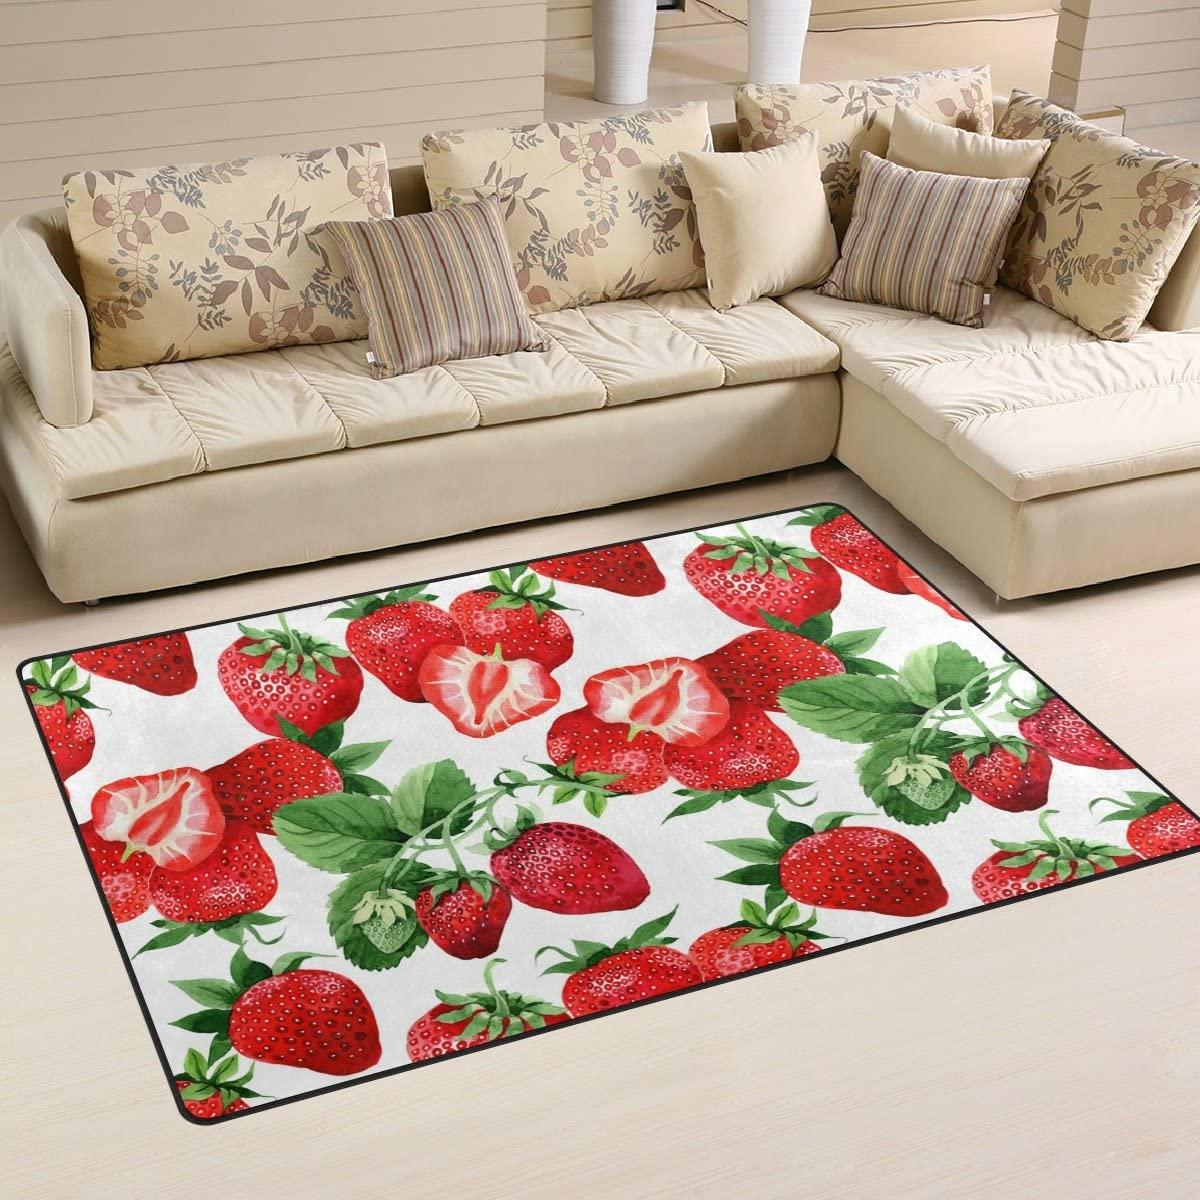 WellLee Area Rug,Watercolor Style Strawberry Floor Rug Non-Slip Doormat for Living Dining Dorm Room Bedroom Decor 31x20 Inch